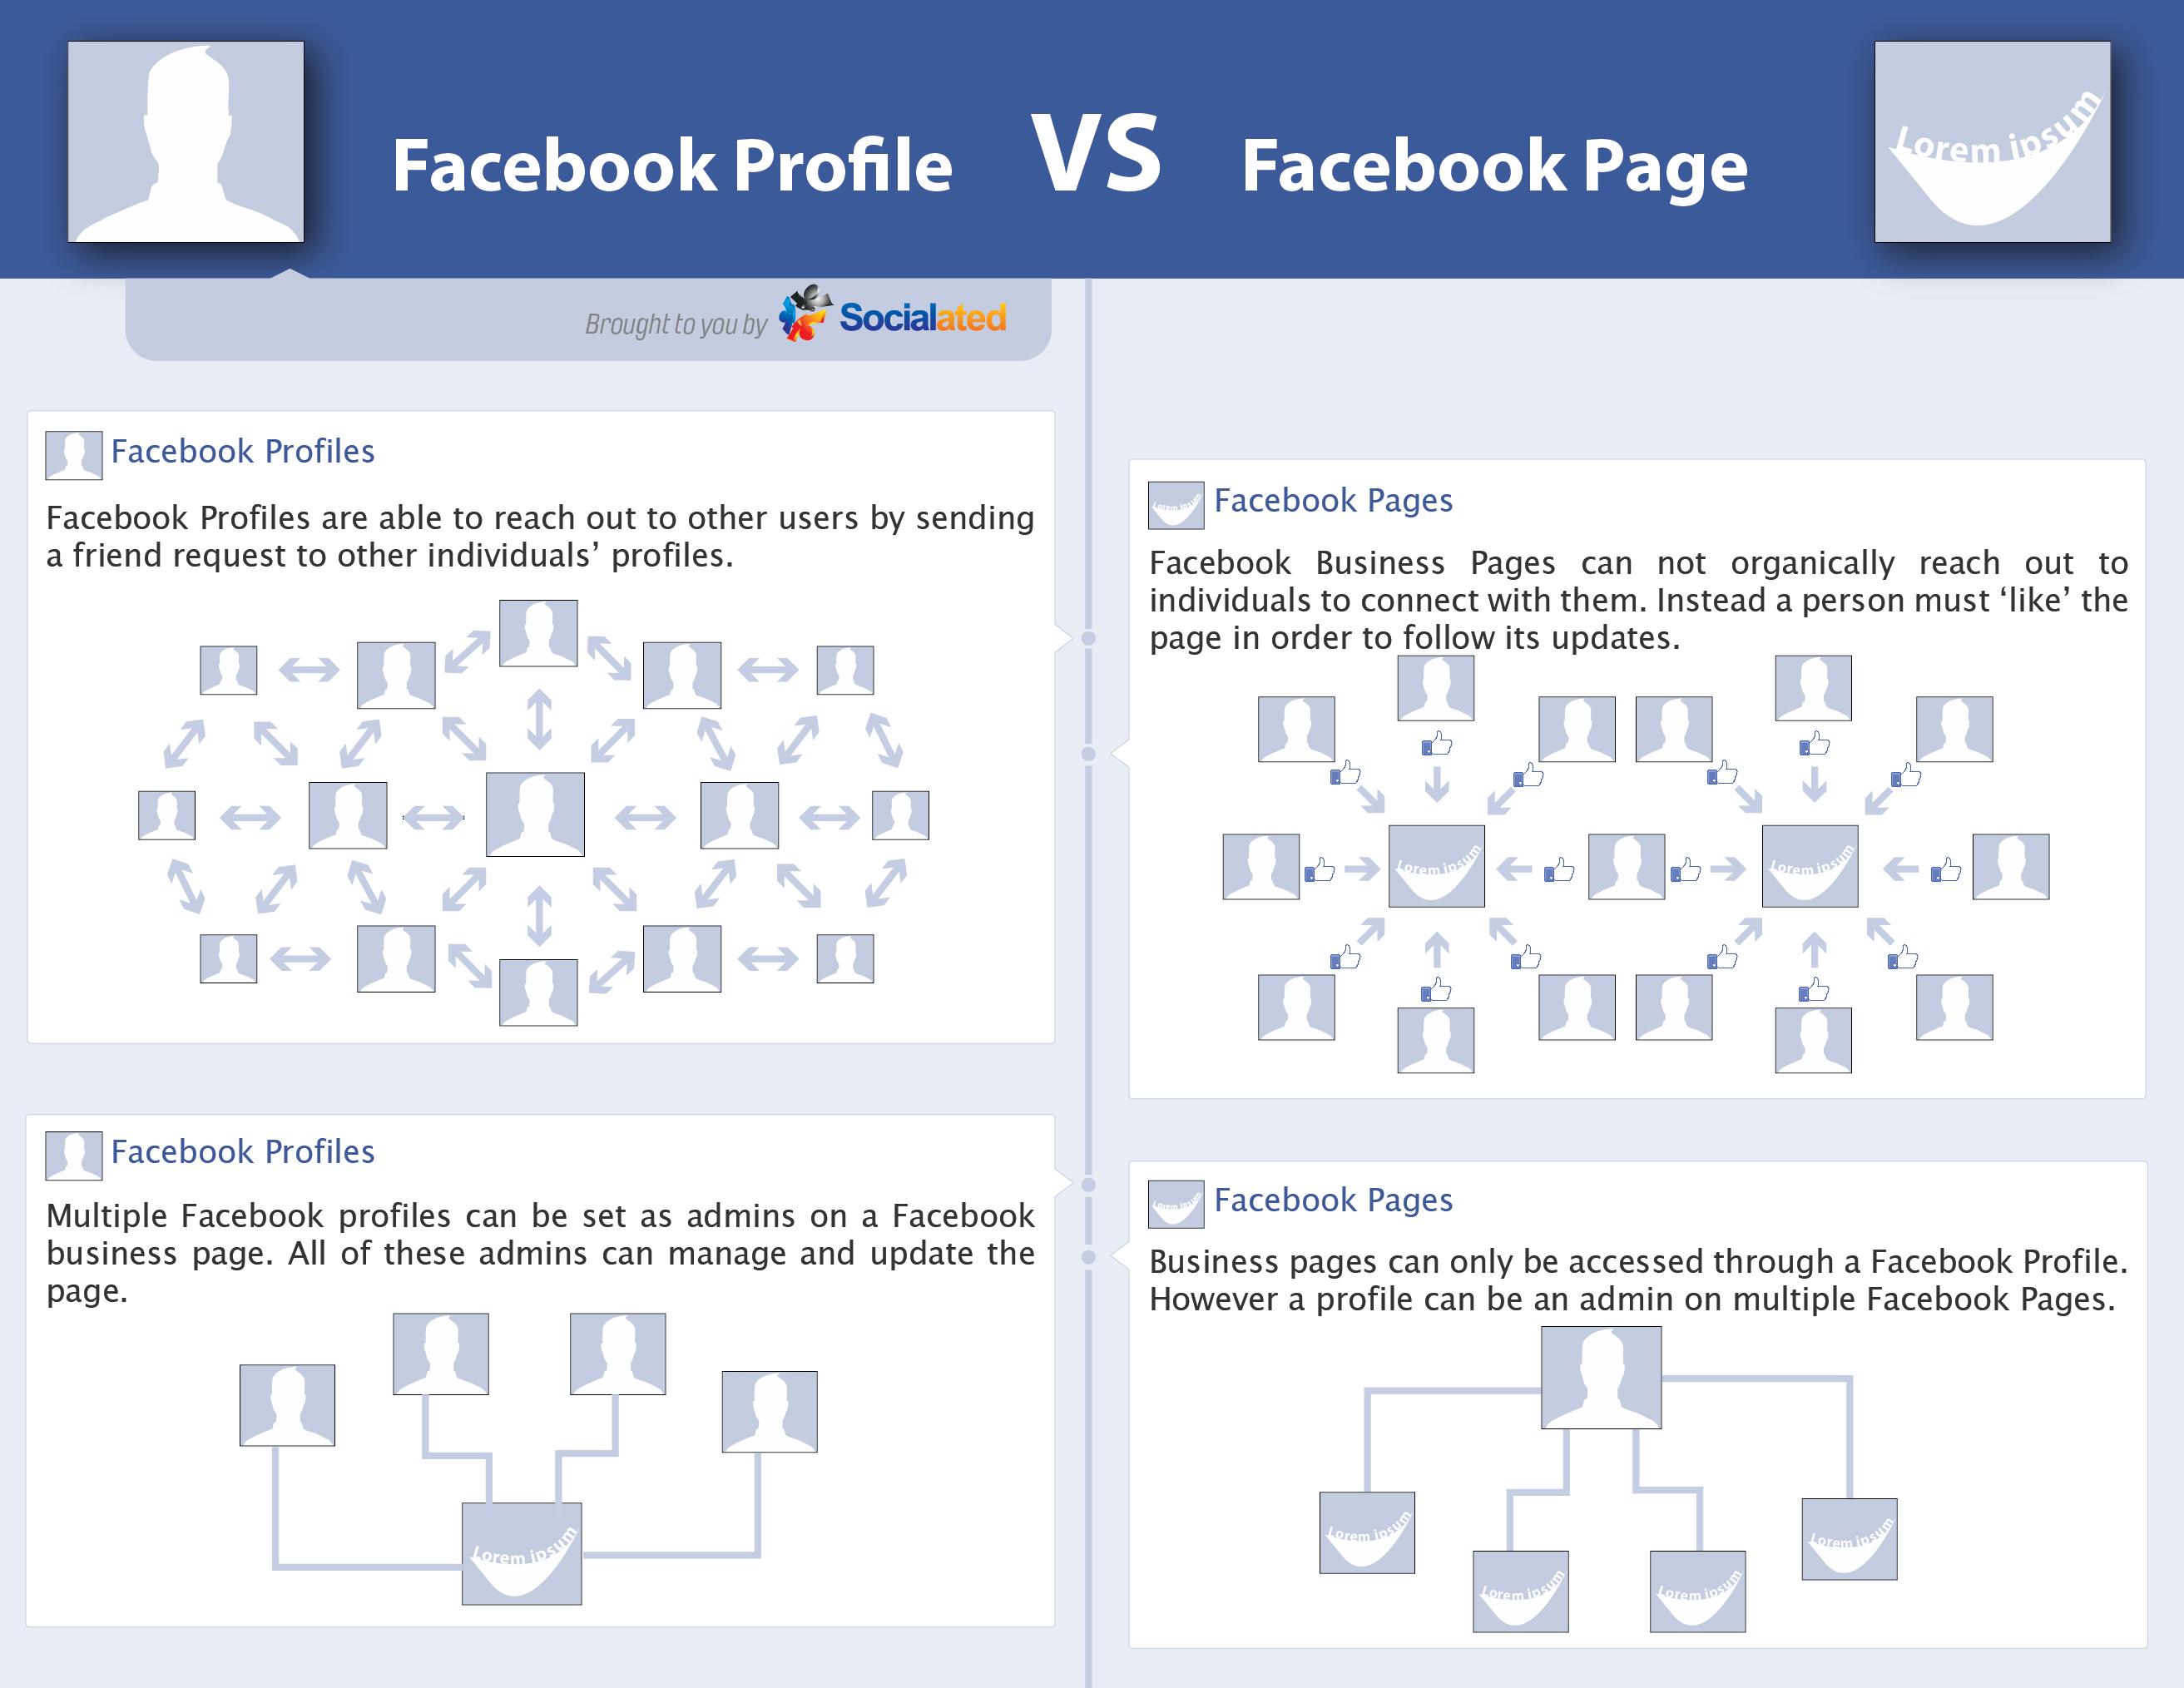 facebook-page-for-business-versus-facebook-profile-2